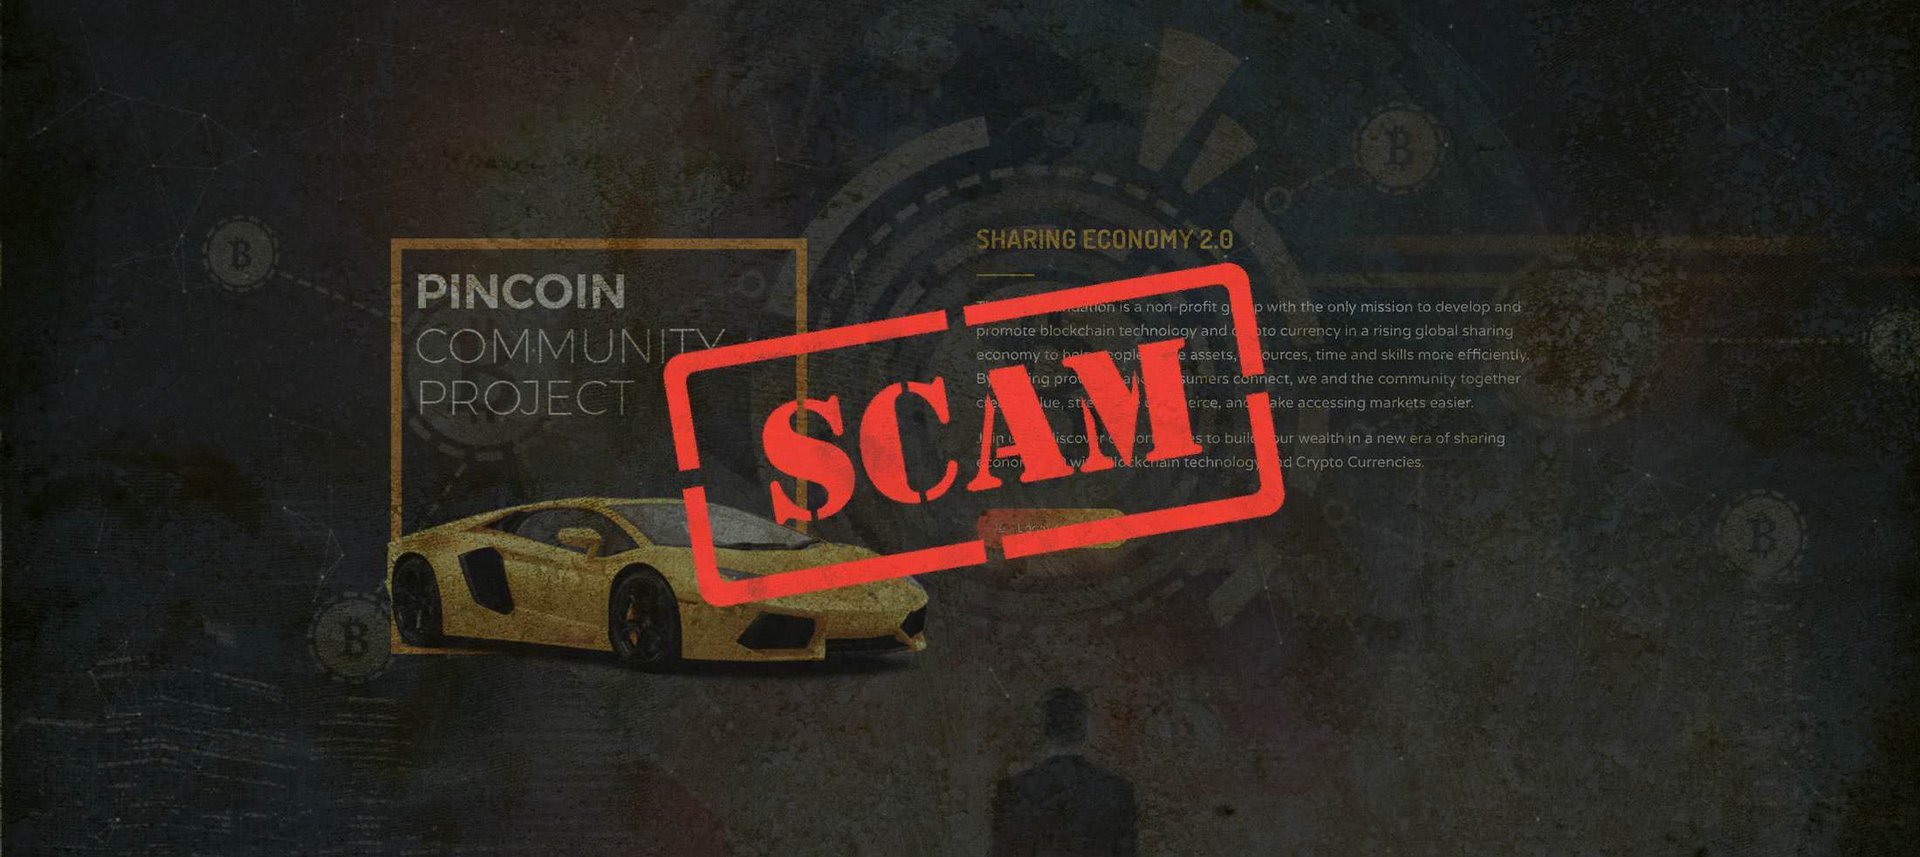 Pincoin io: The $660 Million Scam ICO Business